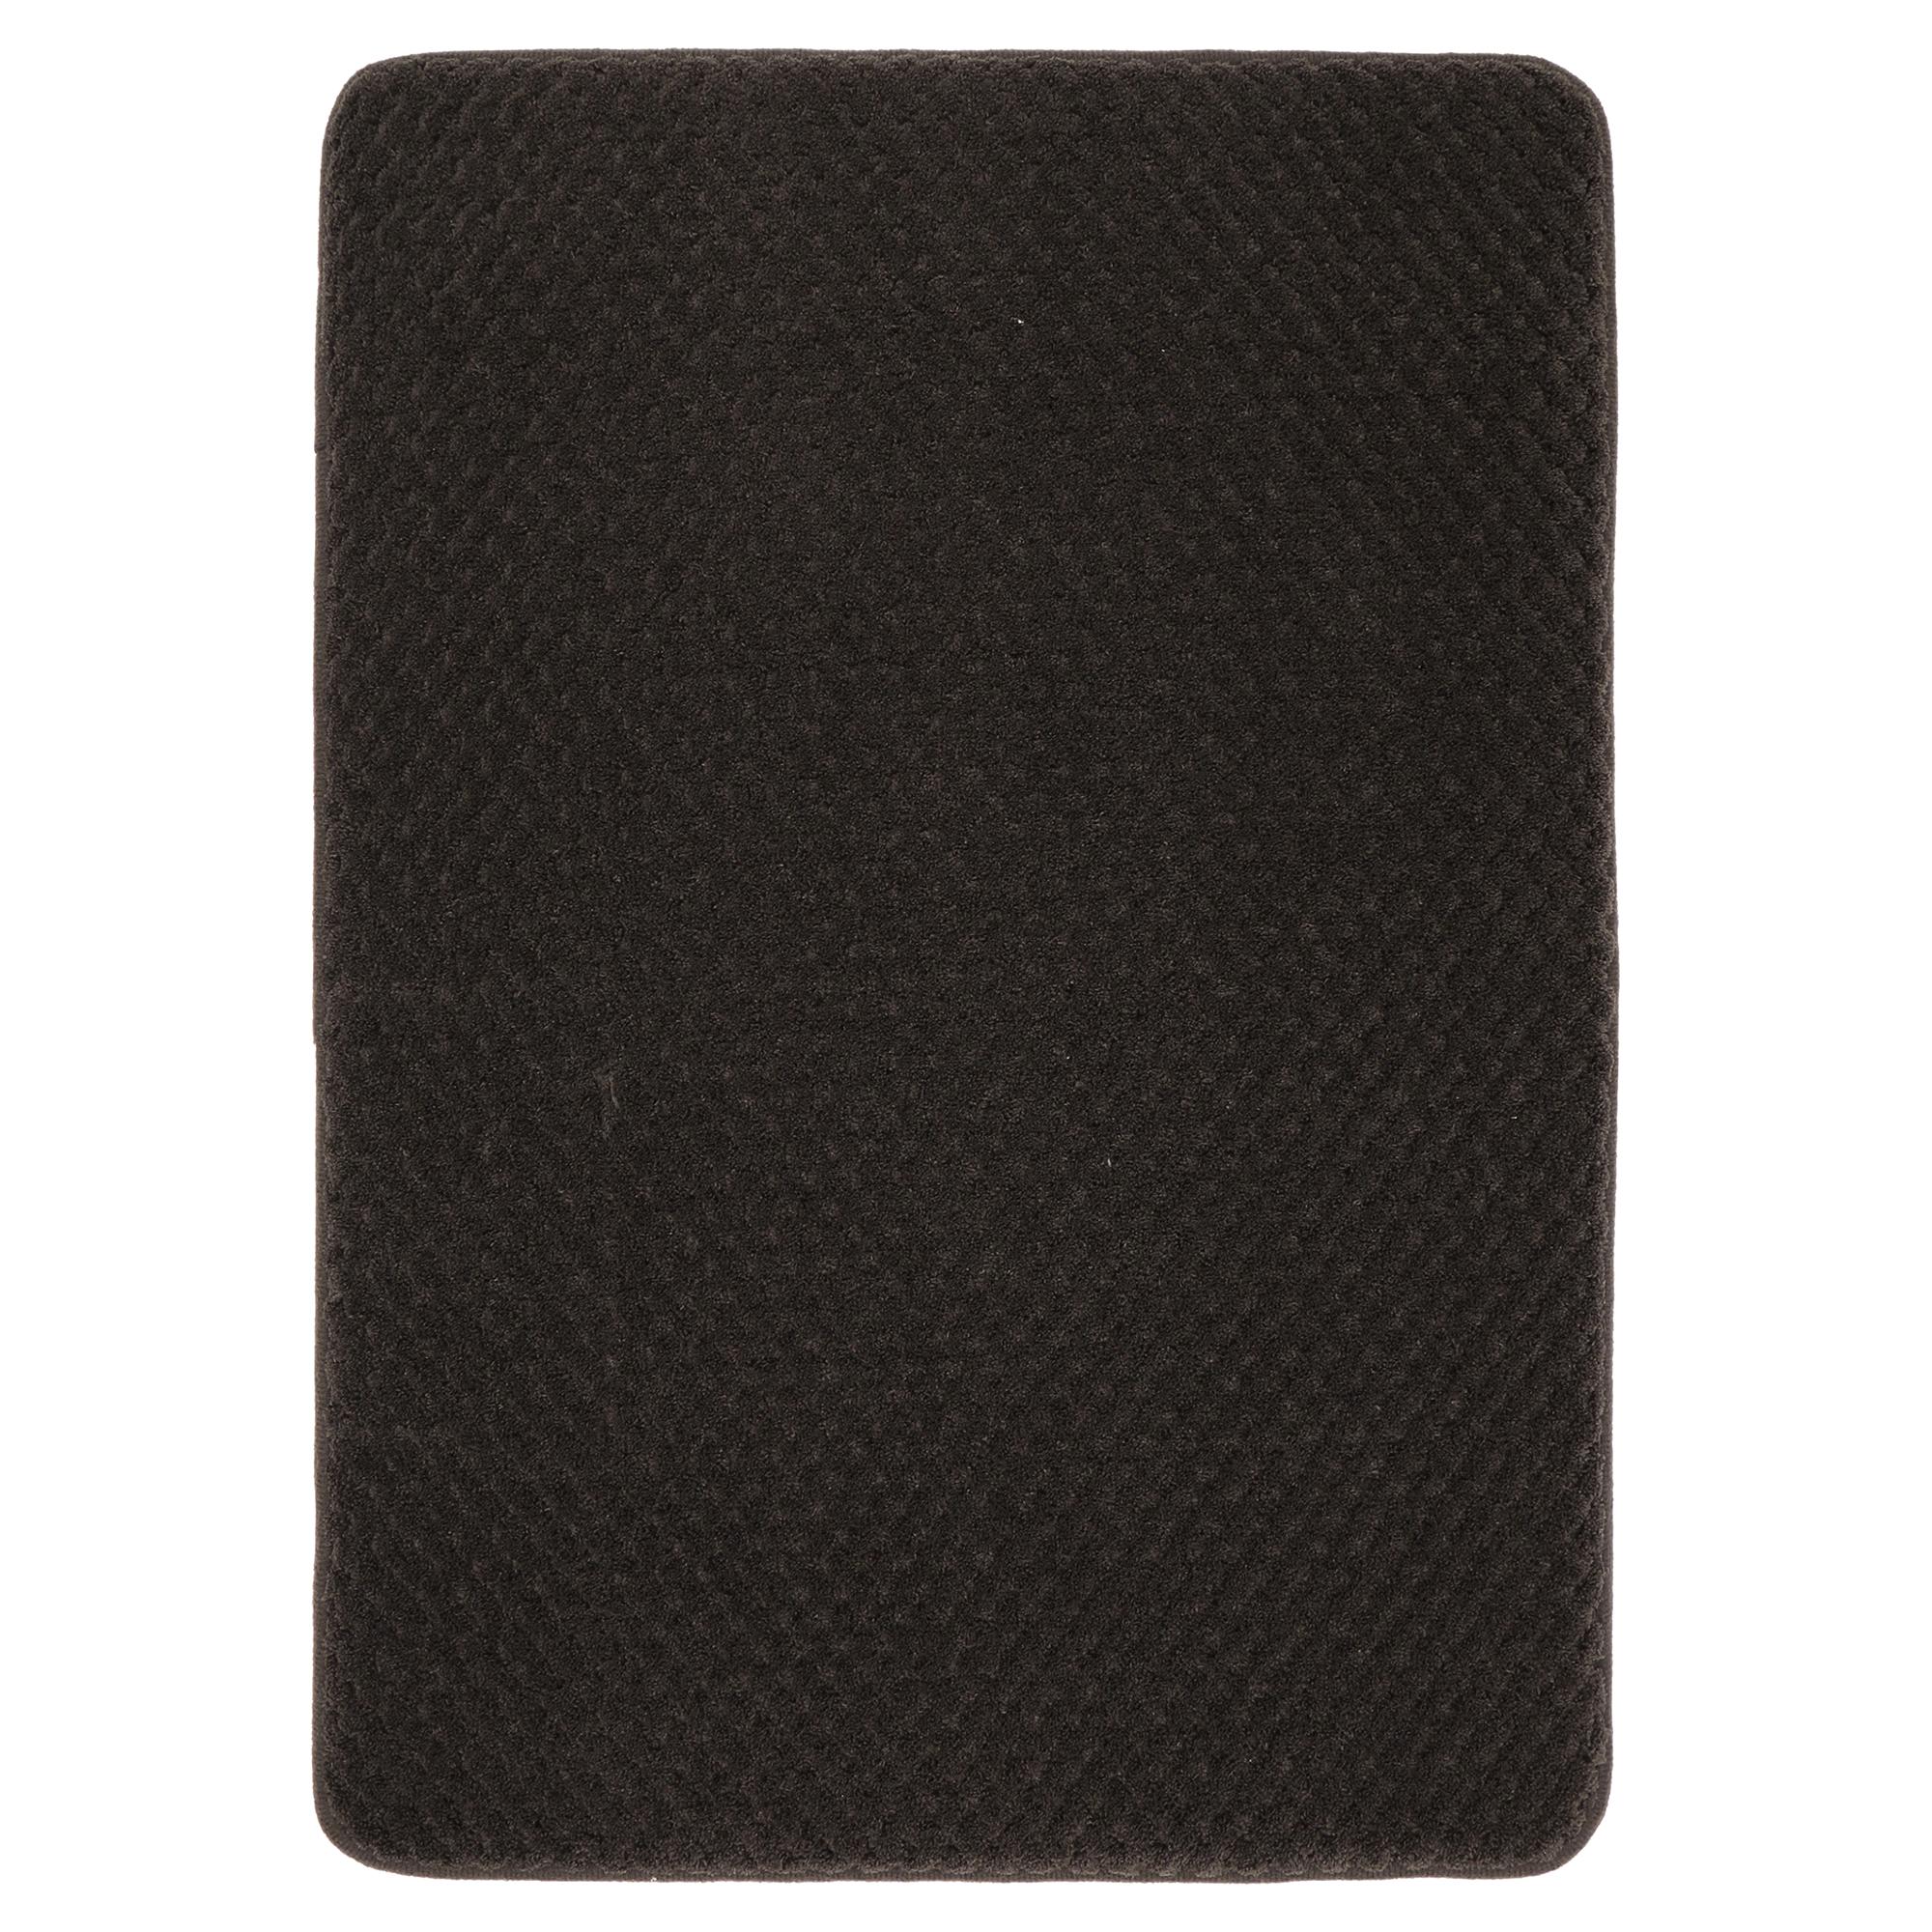 mohawk home bath rug memory foam chocolate 17 x 24 | meijer